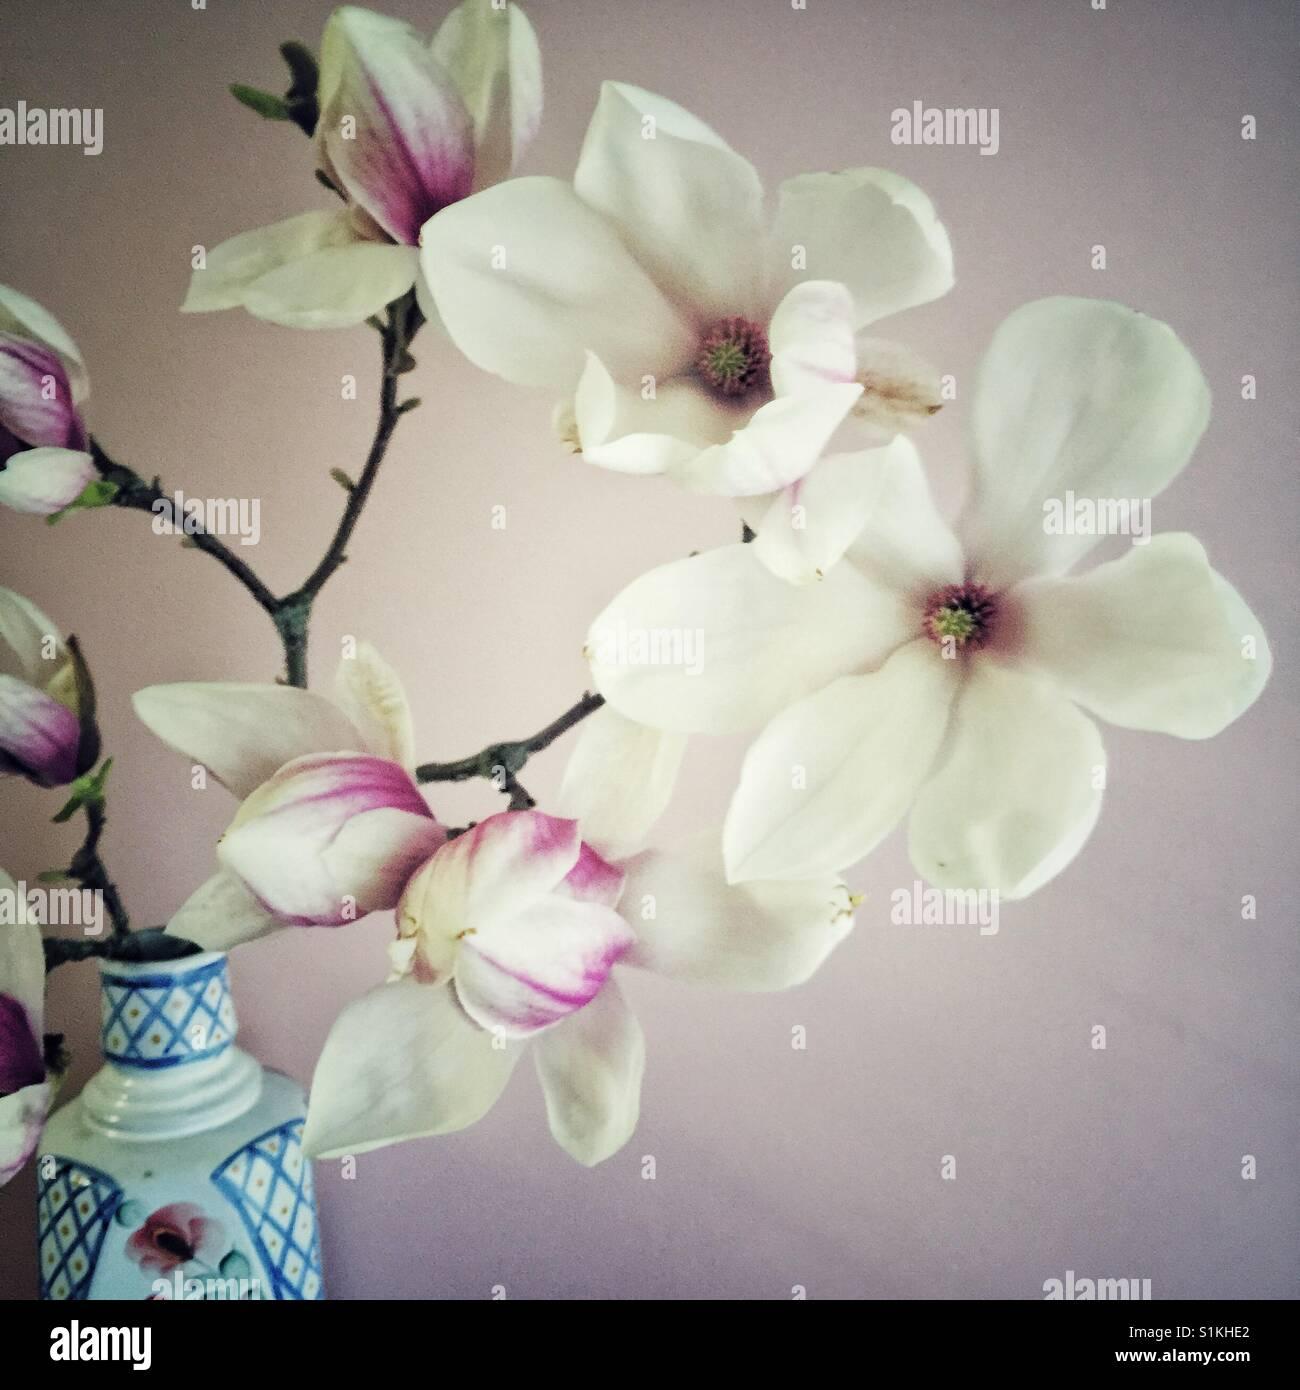 Magical magnolia blossoms - Stock Image